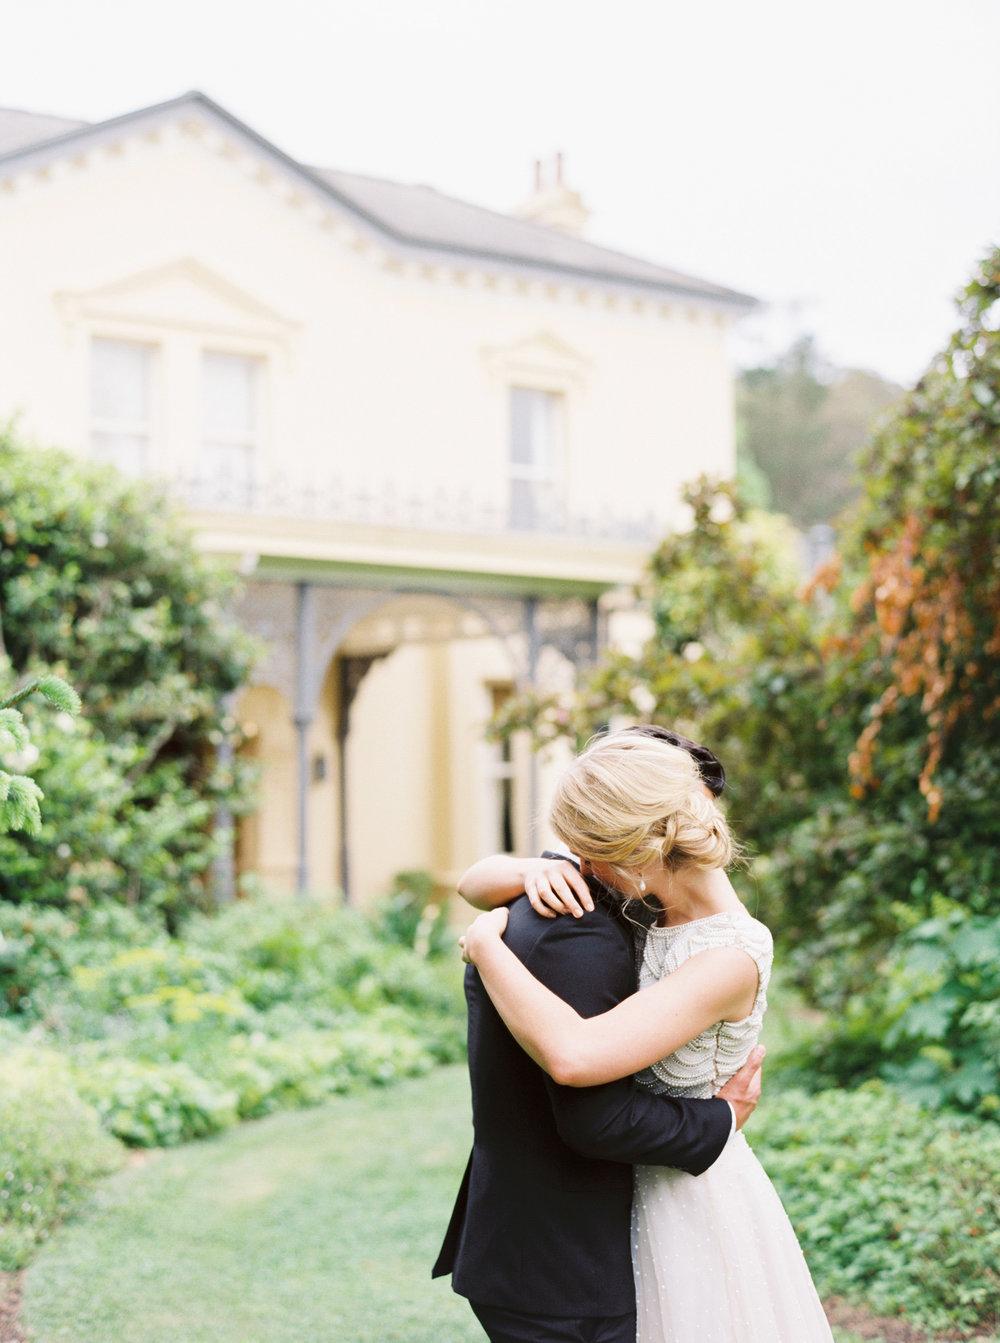 Timeless Southern Highland Wedding Elopement in Bowral NSW Fine Art Film Photographer Sheri McMahon-43.jpg